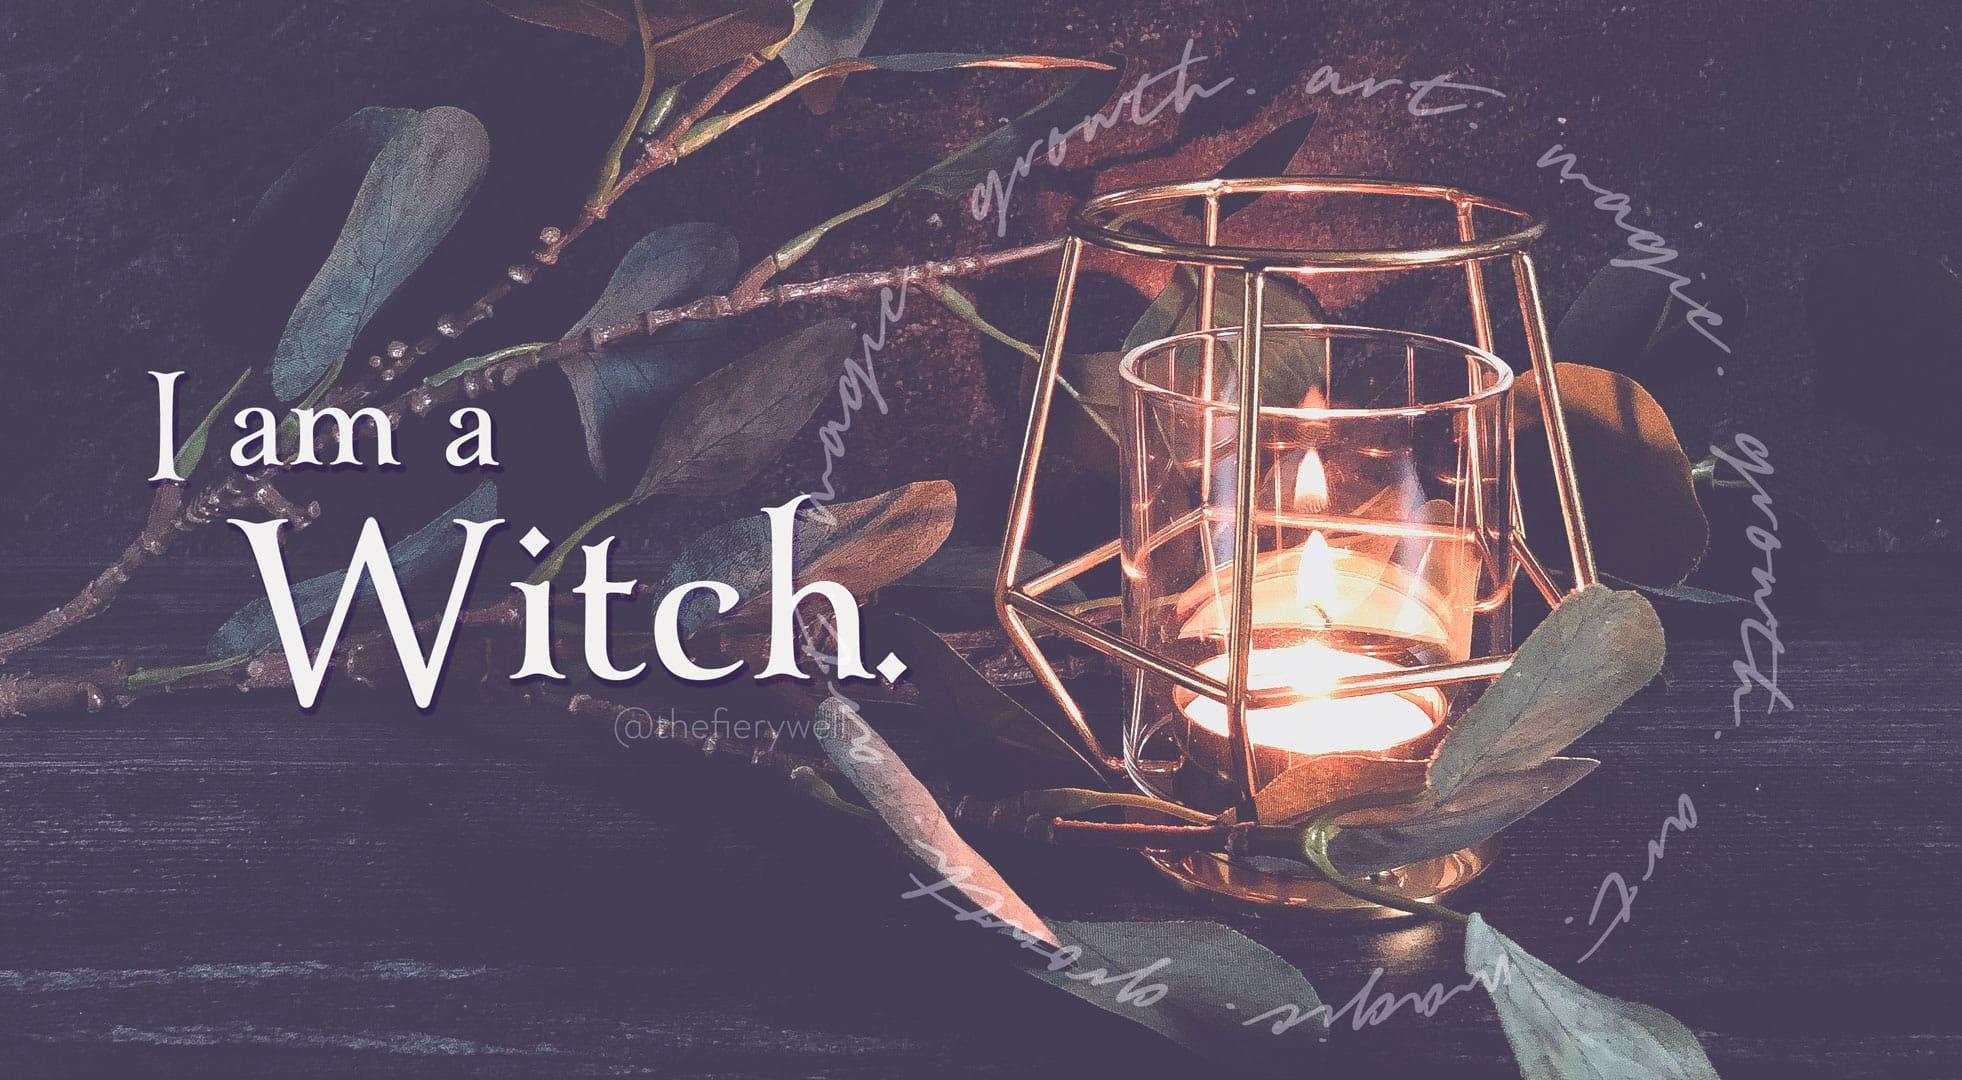 I am a witch.